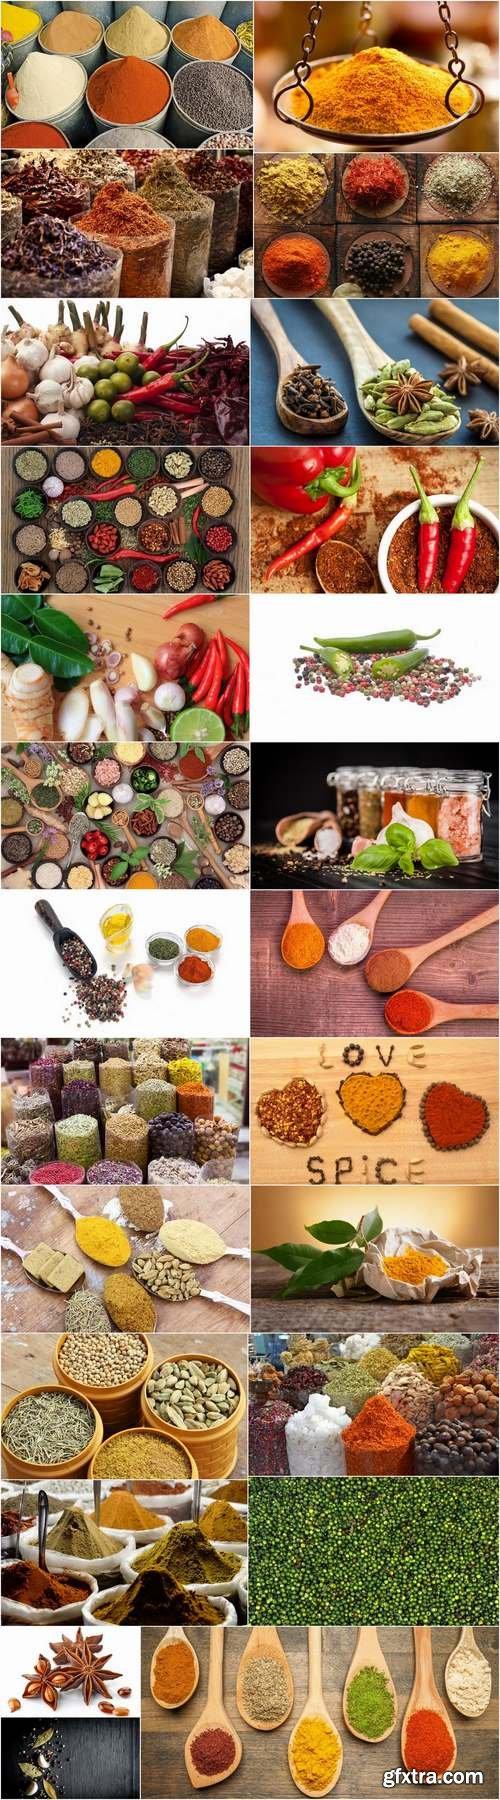 Spices garlic pepper seasoning sharpness 25 HQ Jpeg